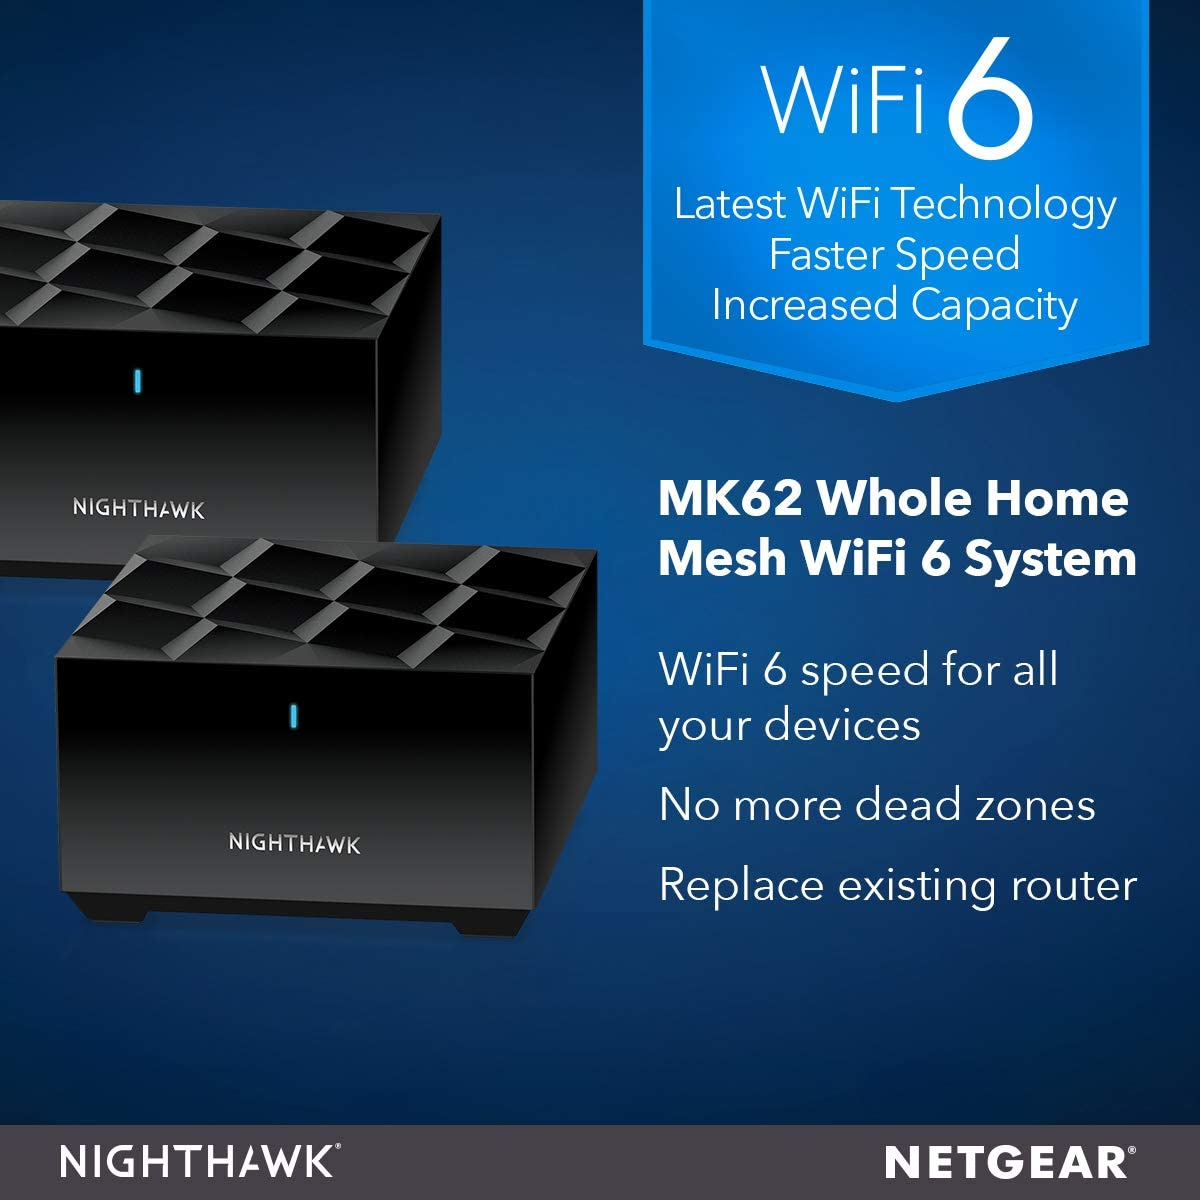 NETGEAR Nighthawk Whole Home Mesh WiFi